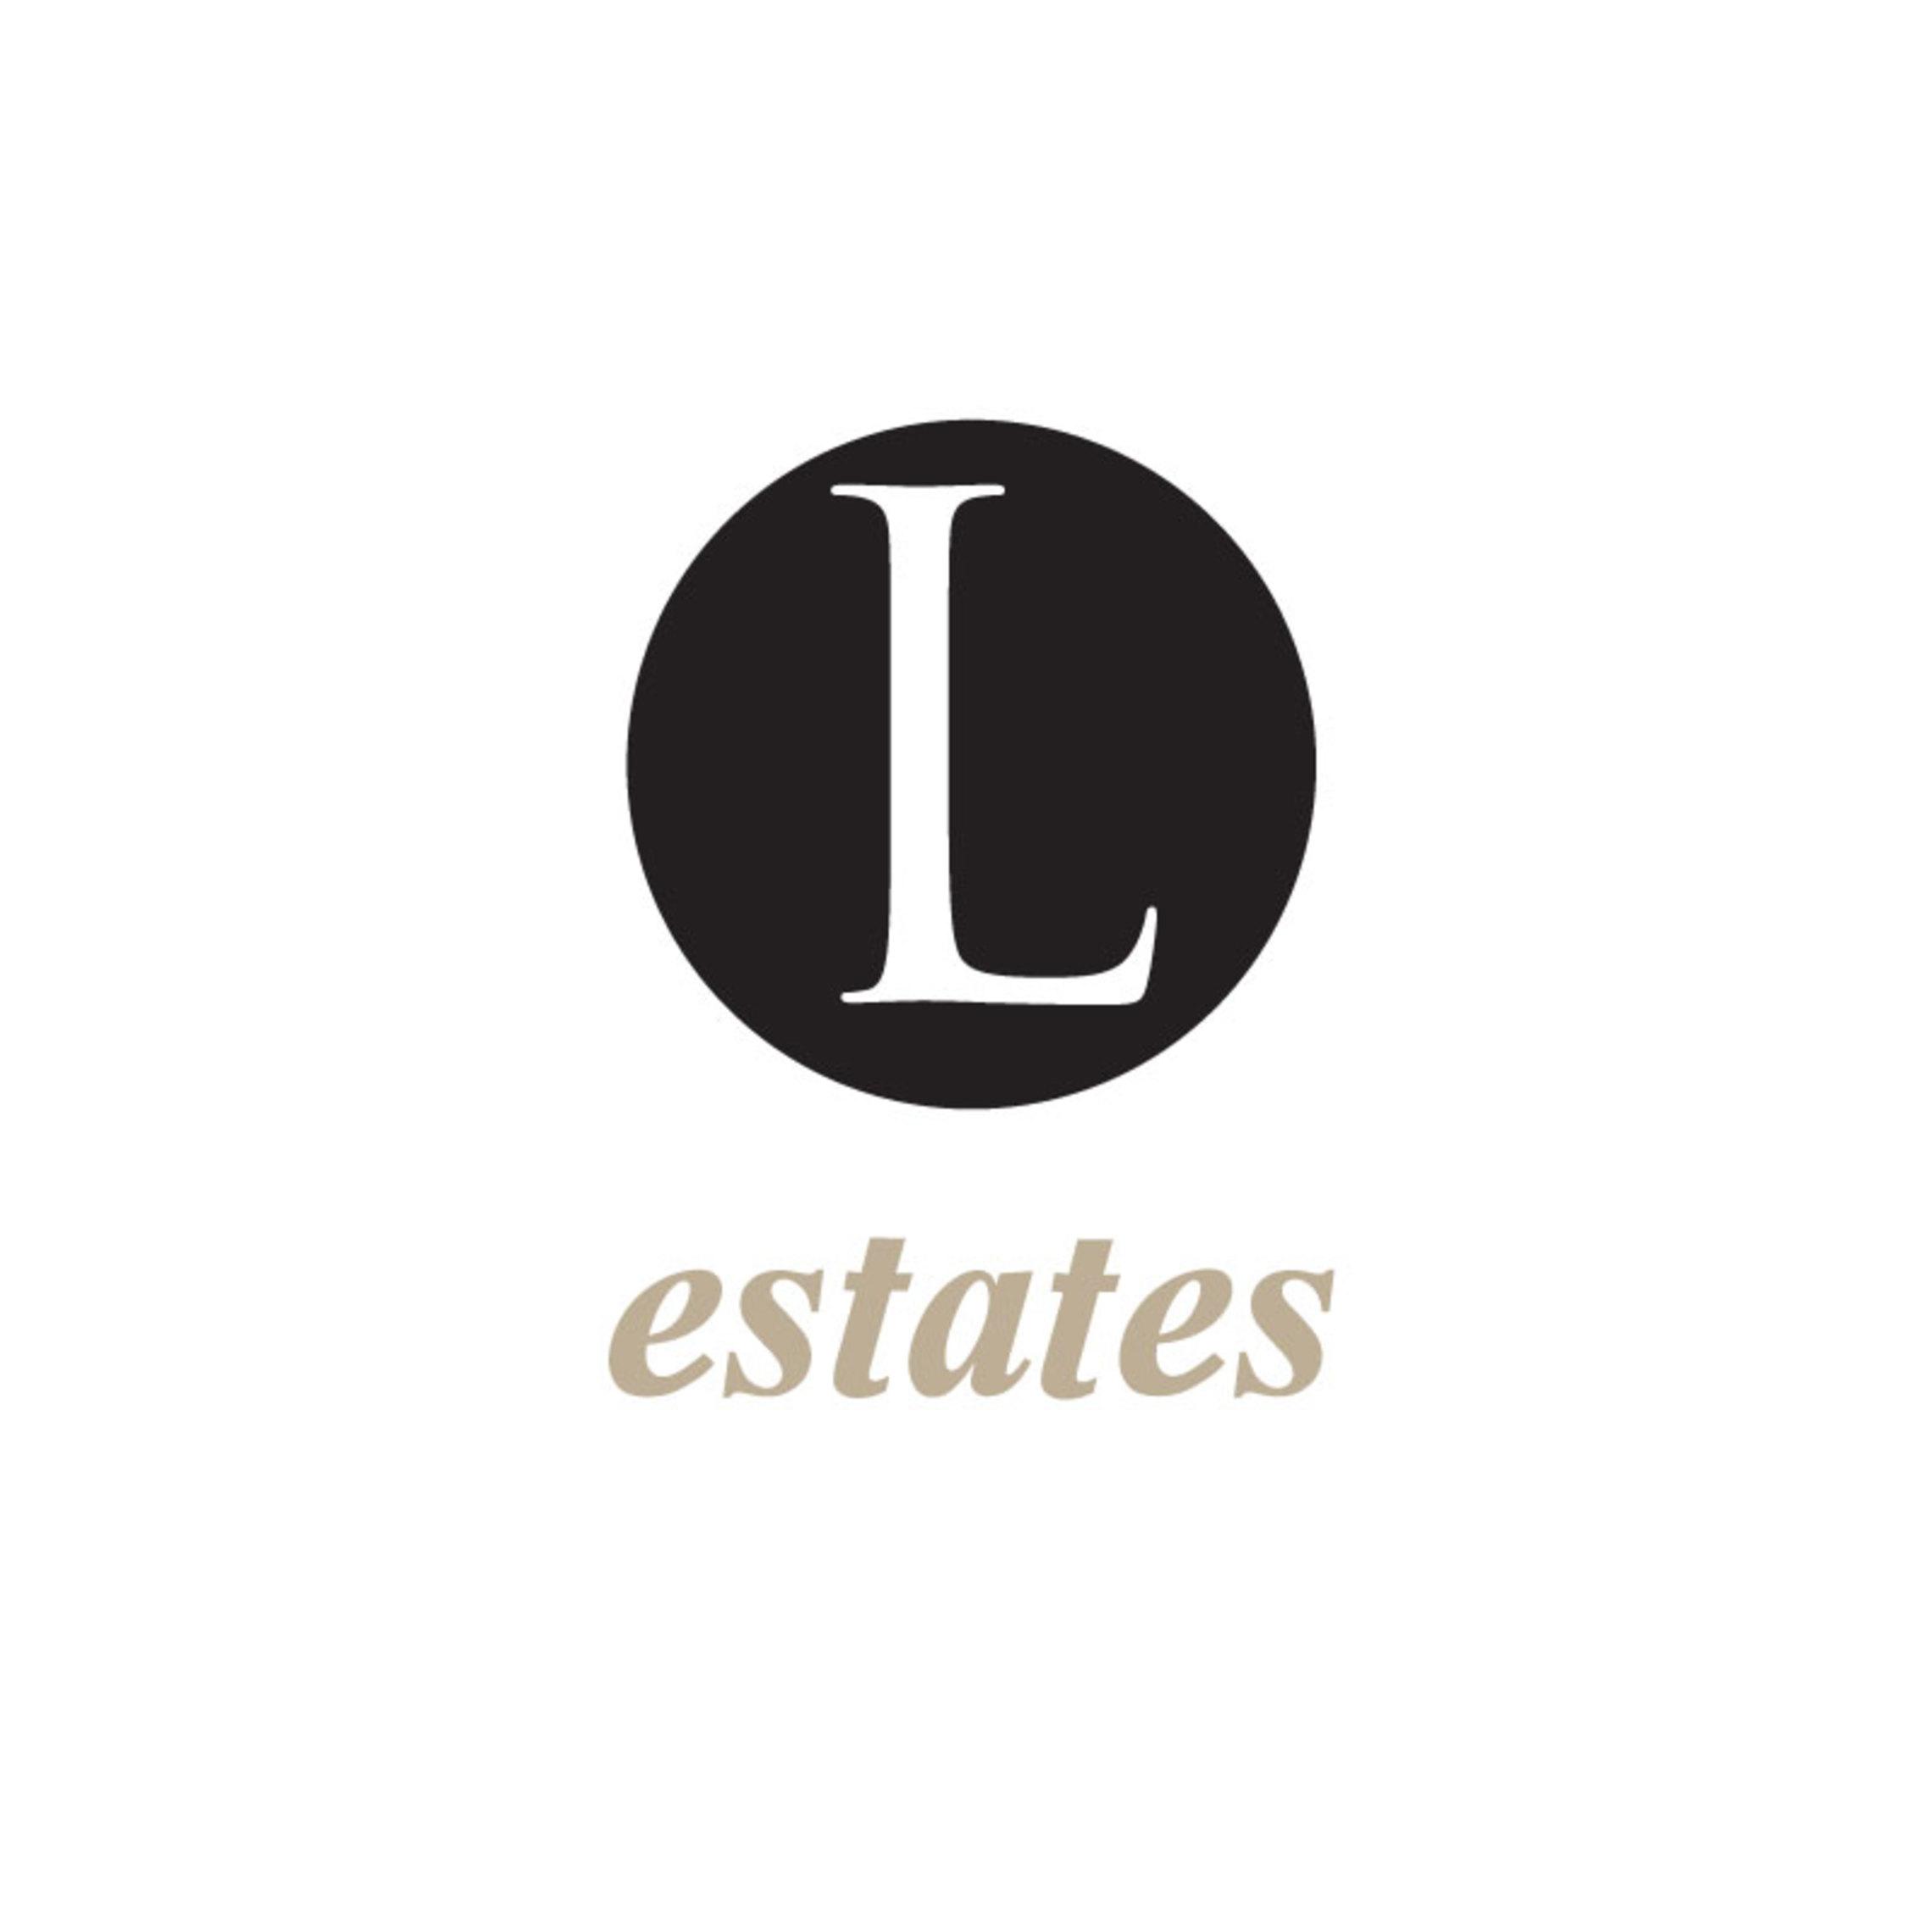 luxify estates- company logo